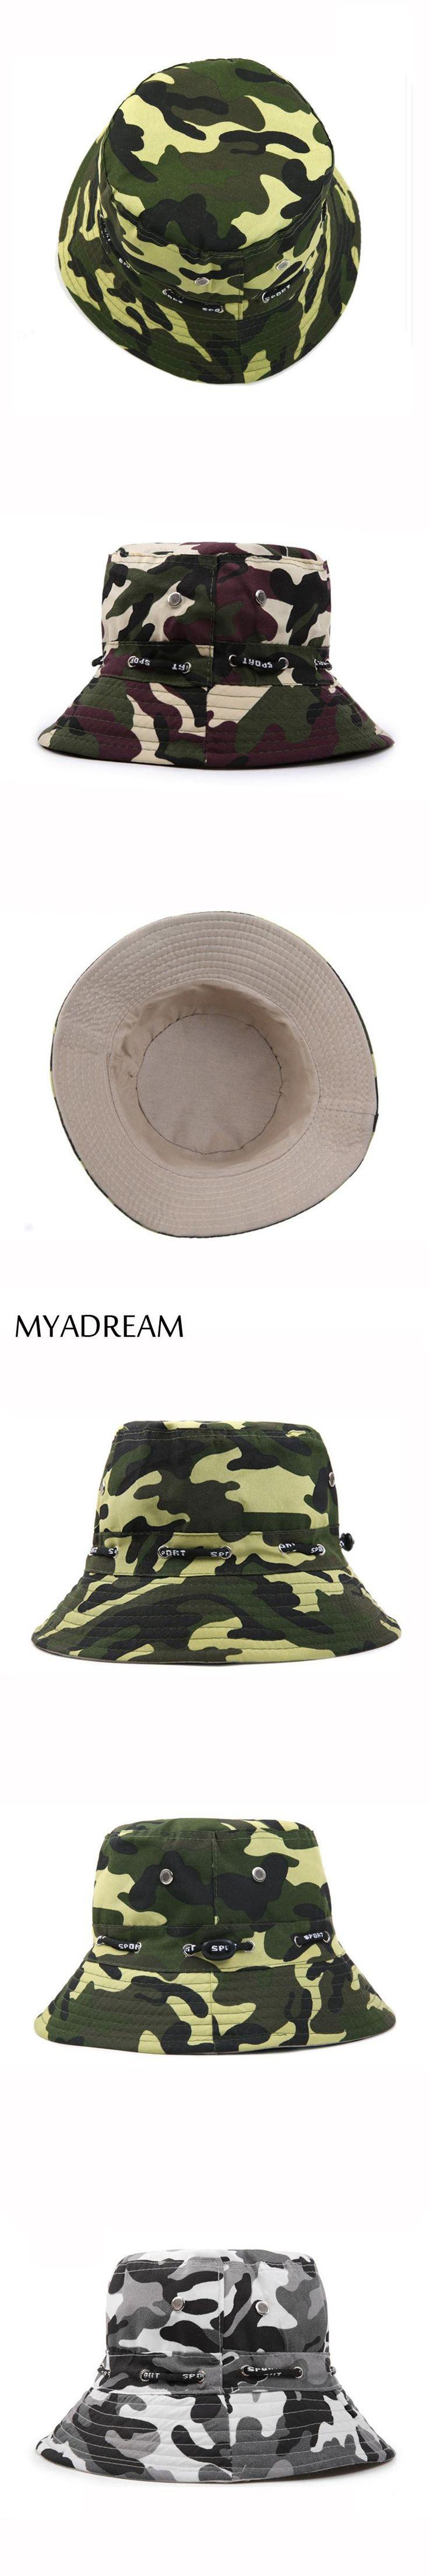 MYADREAM Camoufalge Bucket Hat Chapeu Feminino Bucket Hats for Men Women Flat Top Adjustable Hunting Fishing Hat Boina Cap